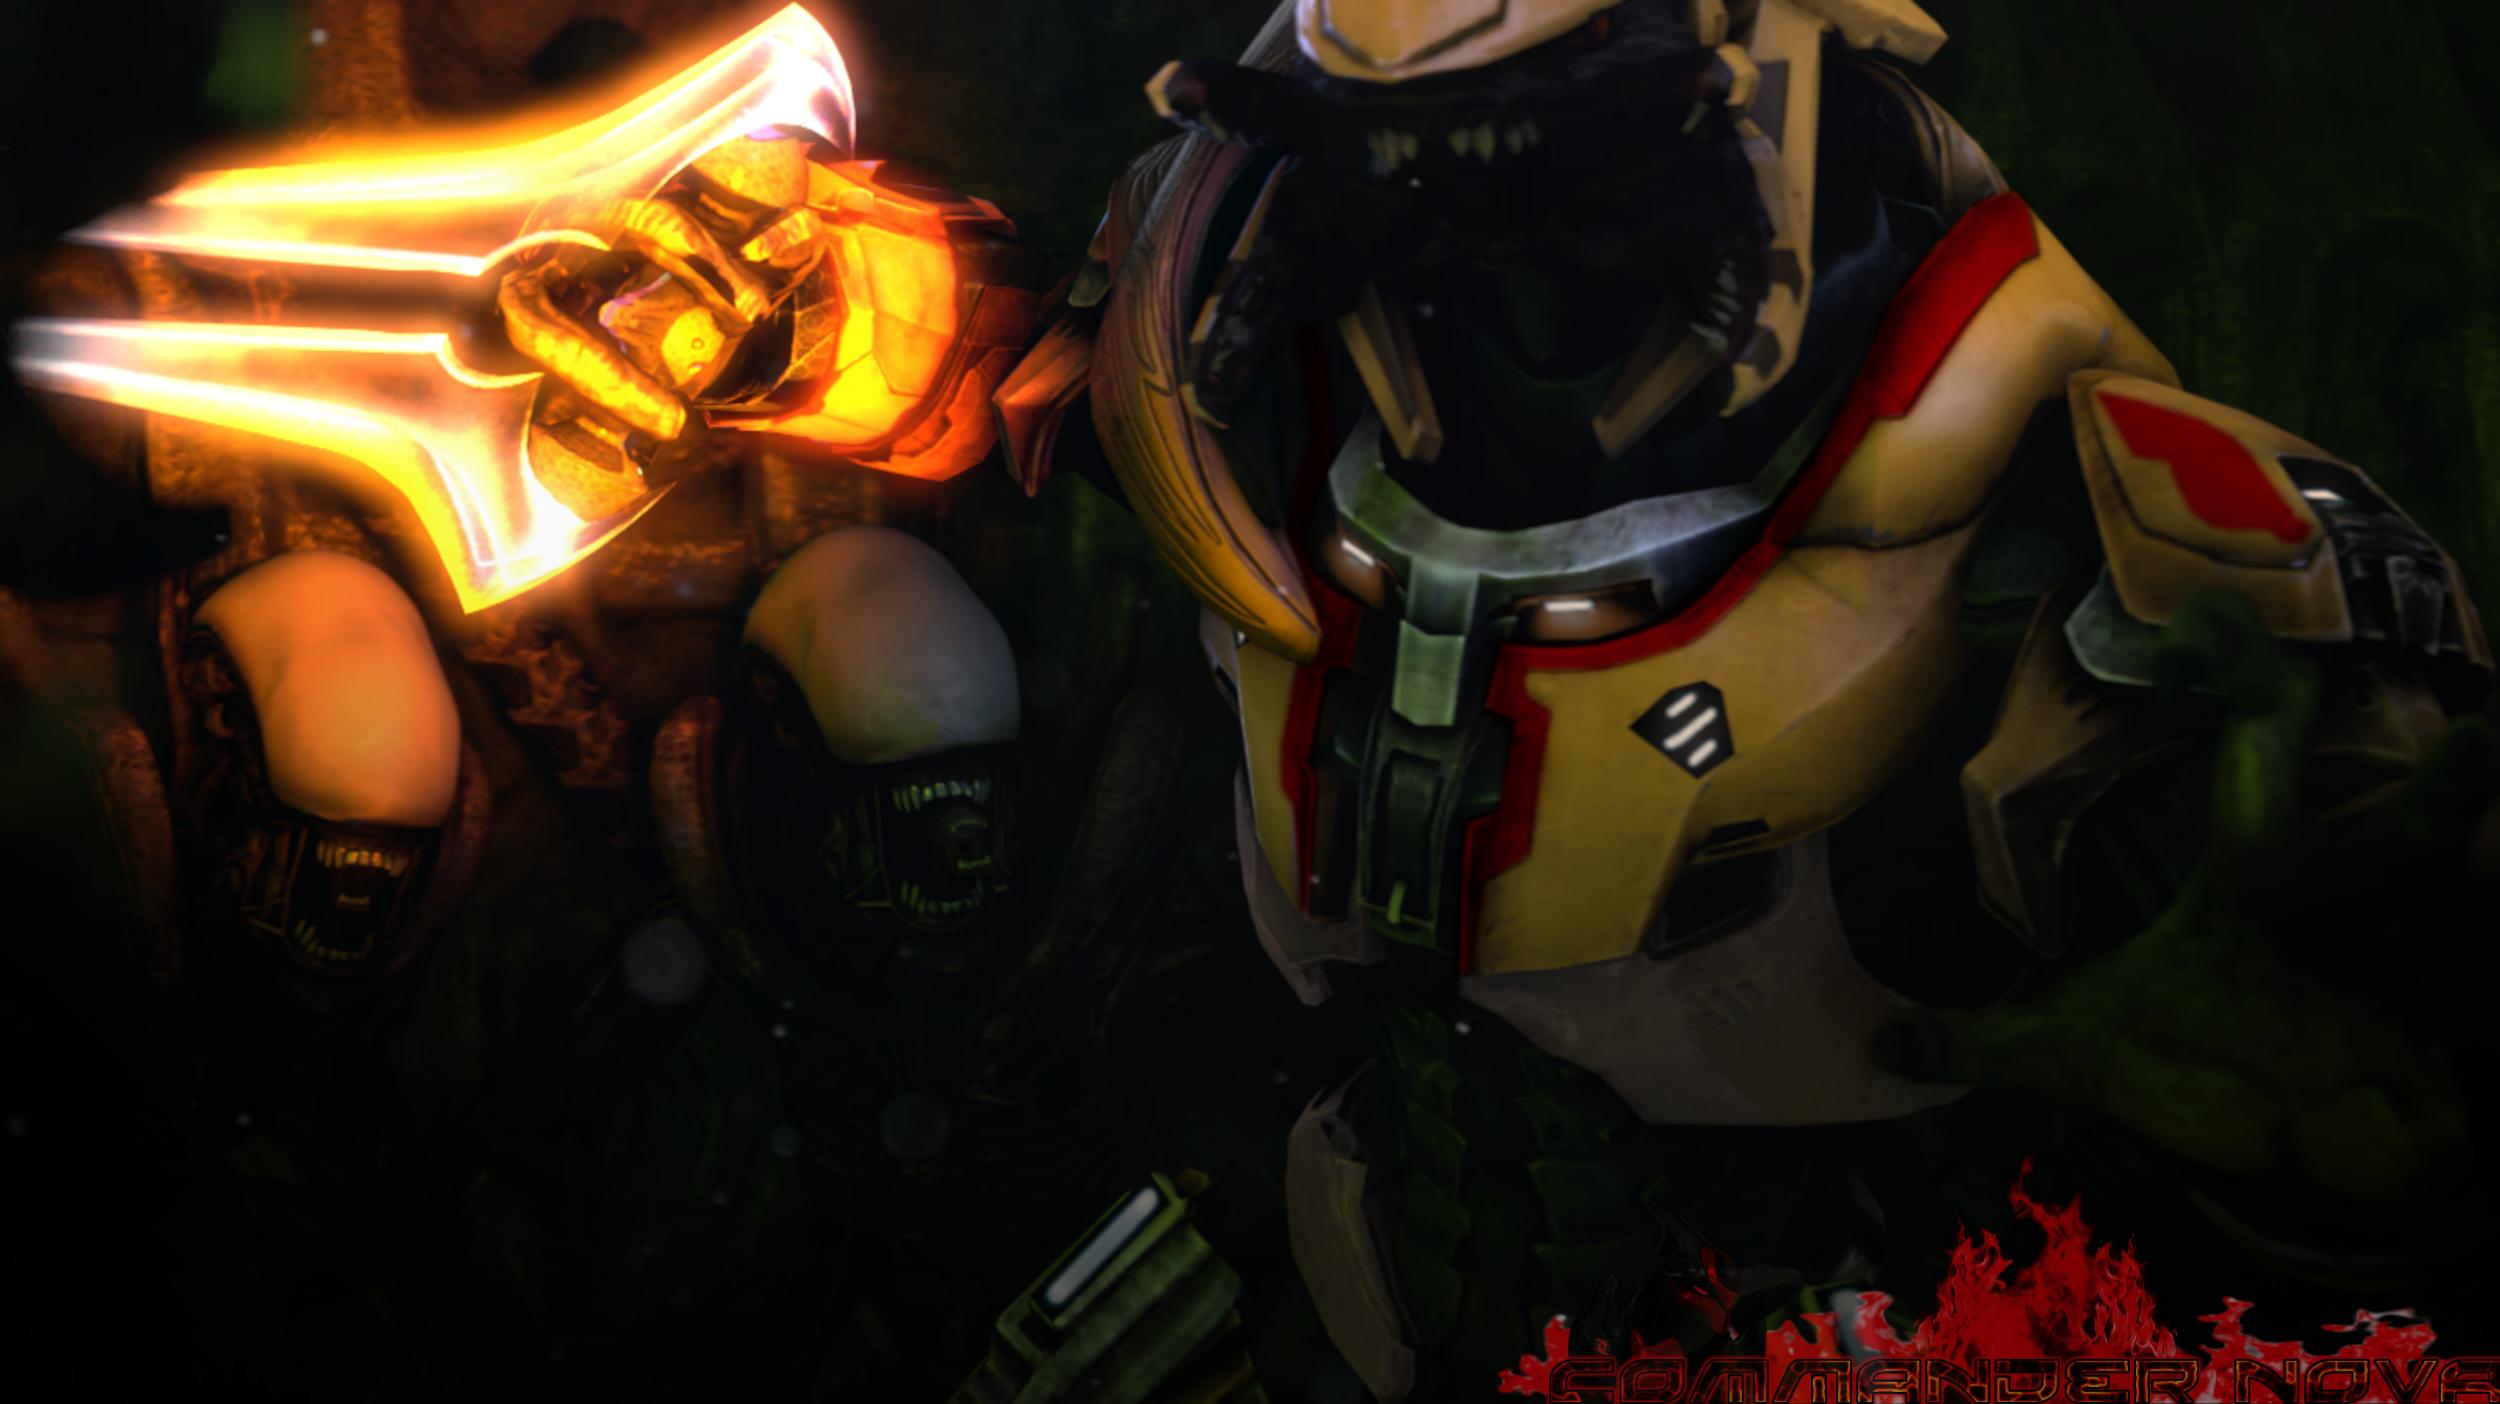 Predatorial Halo Artwork on Predatorial-Halo - DeviantArt